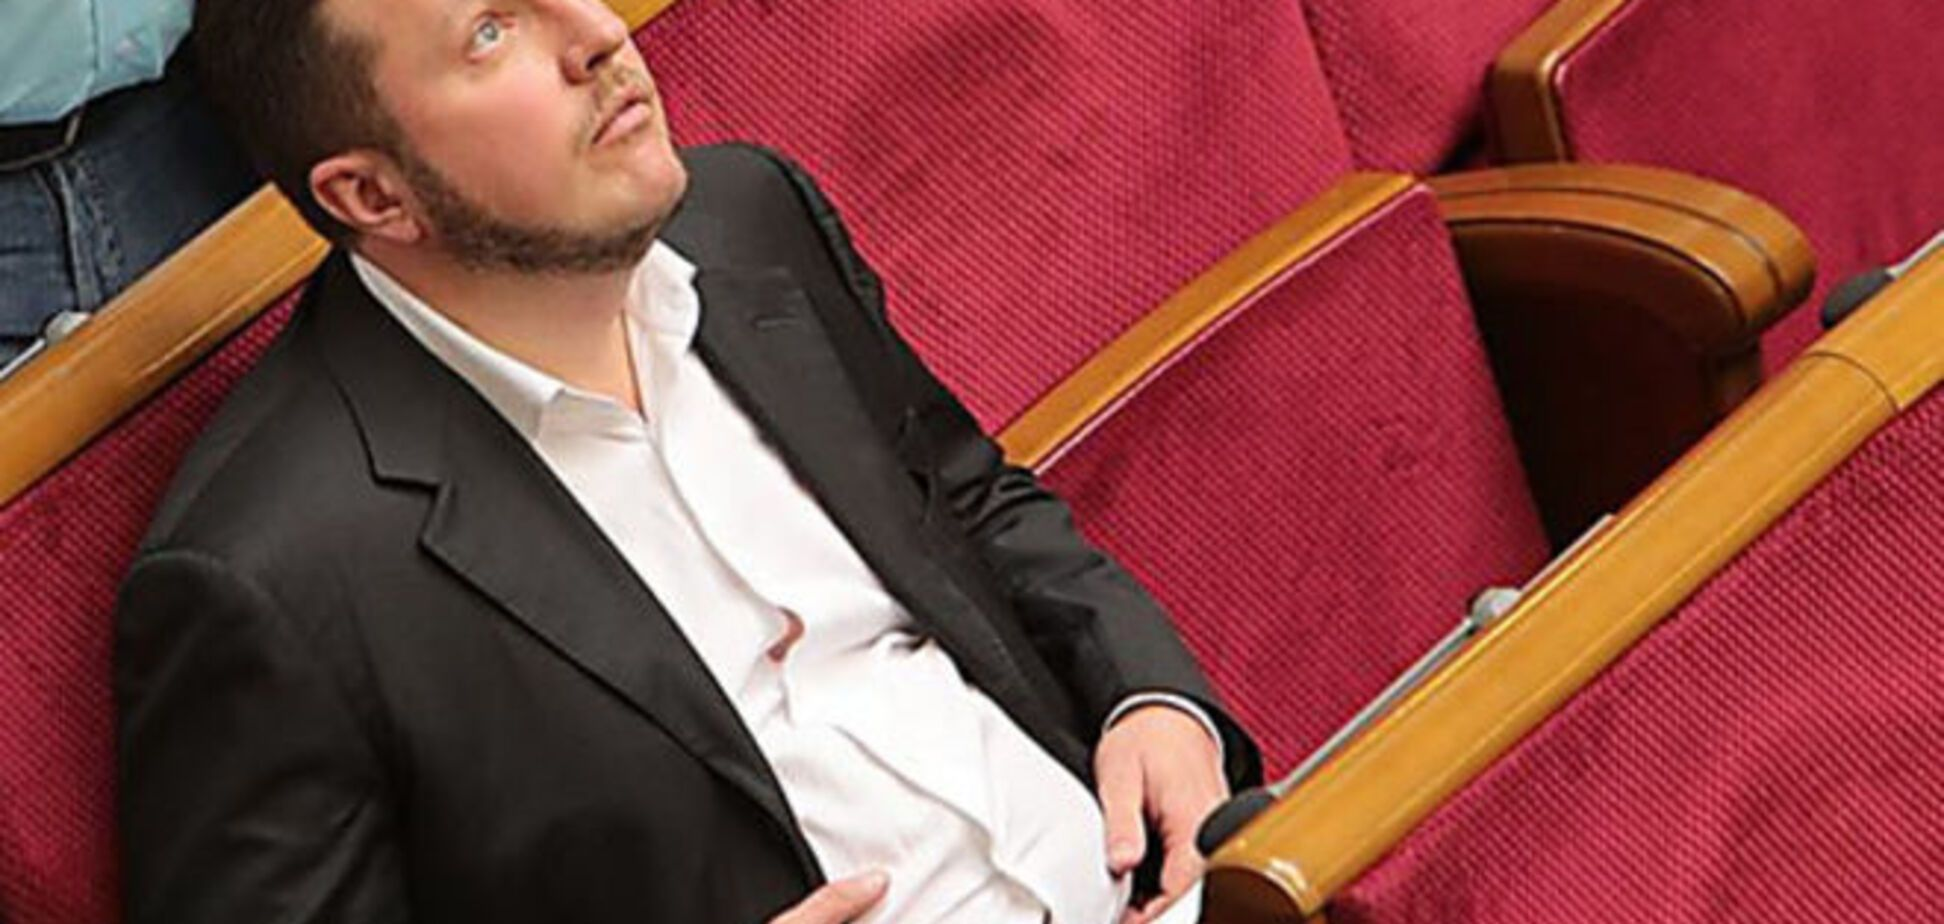 Симфония 'кнопкодавства': нардеп из 'Відрождення' умудрился проголосовать за 6 коллег одновременно, фотофакт